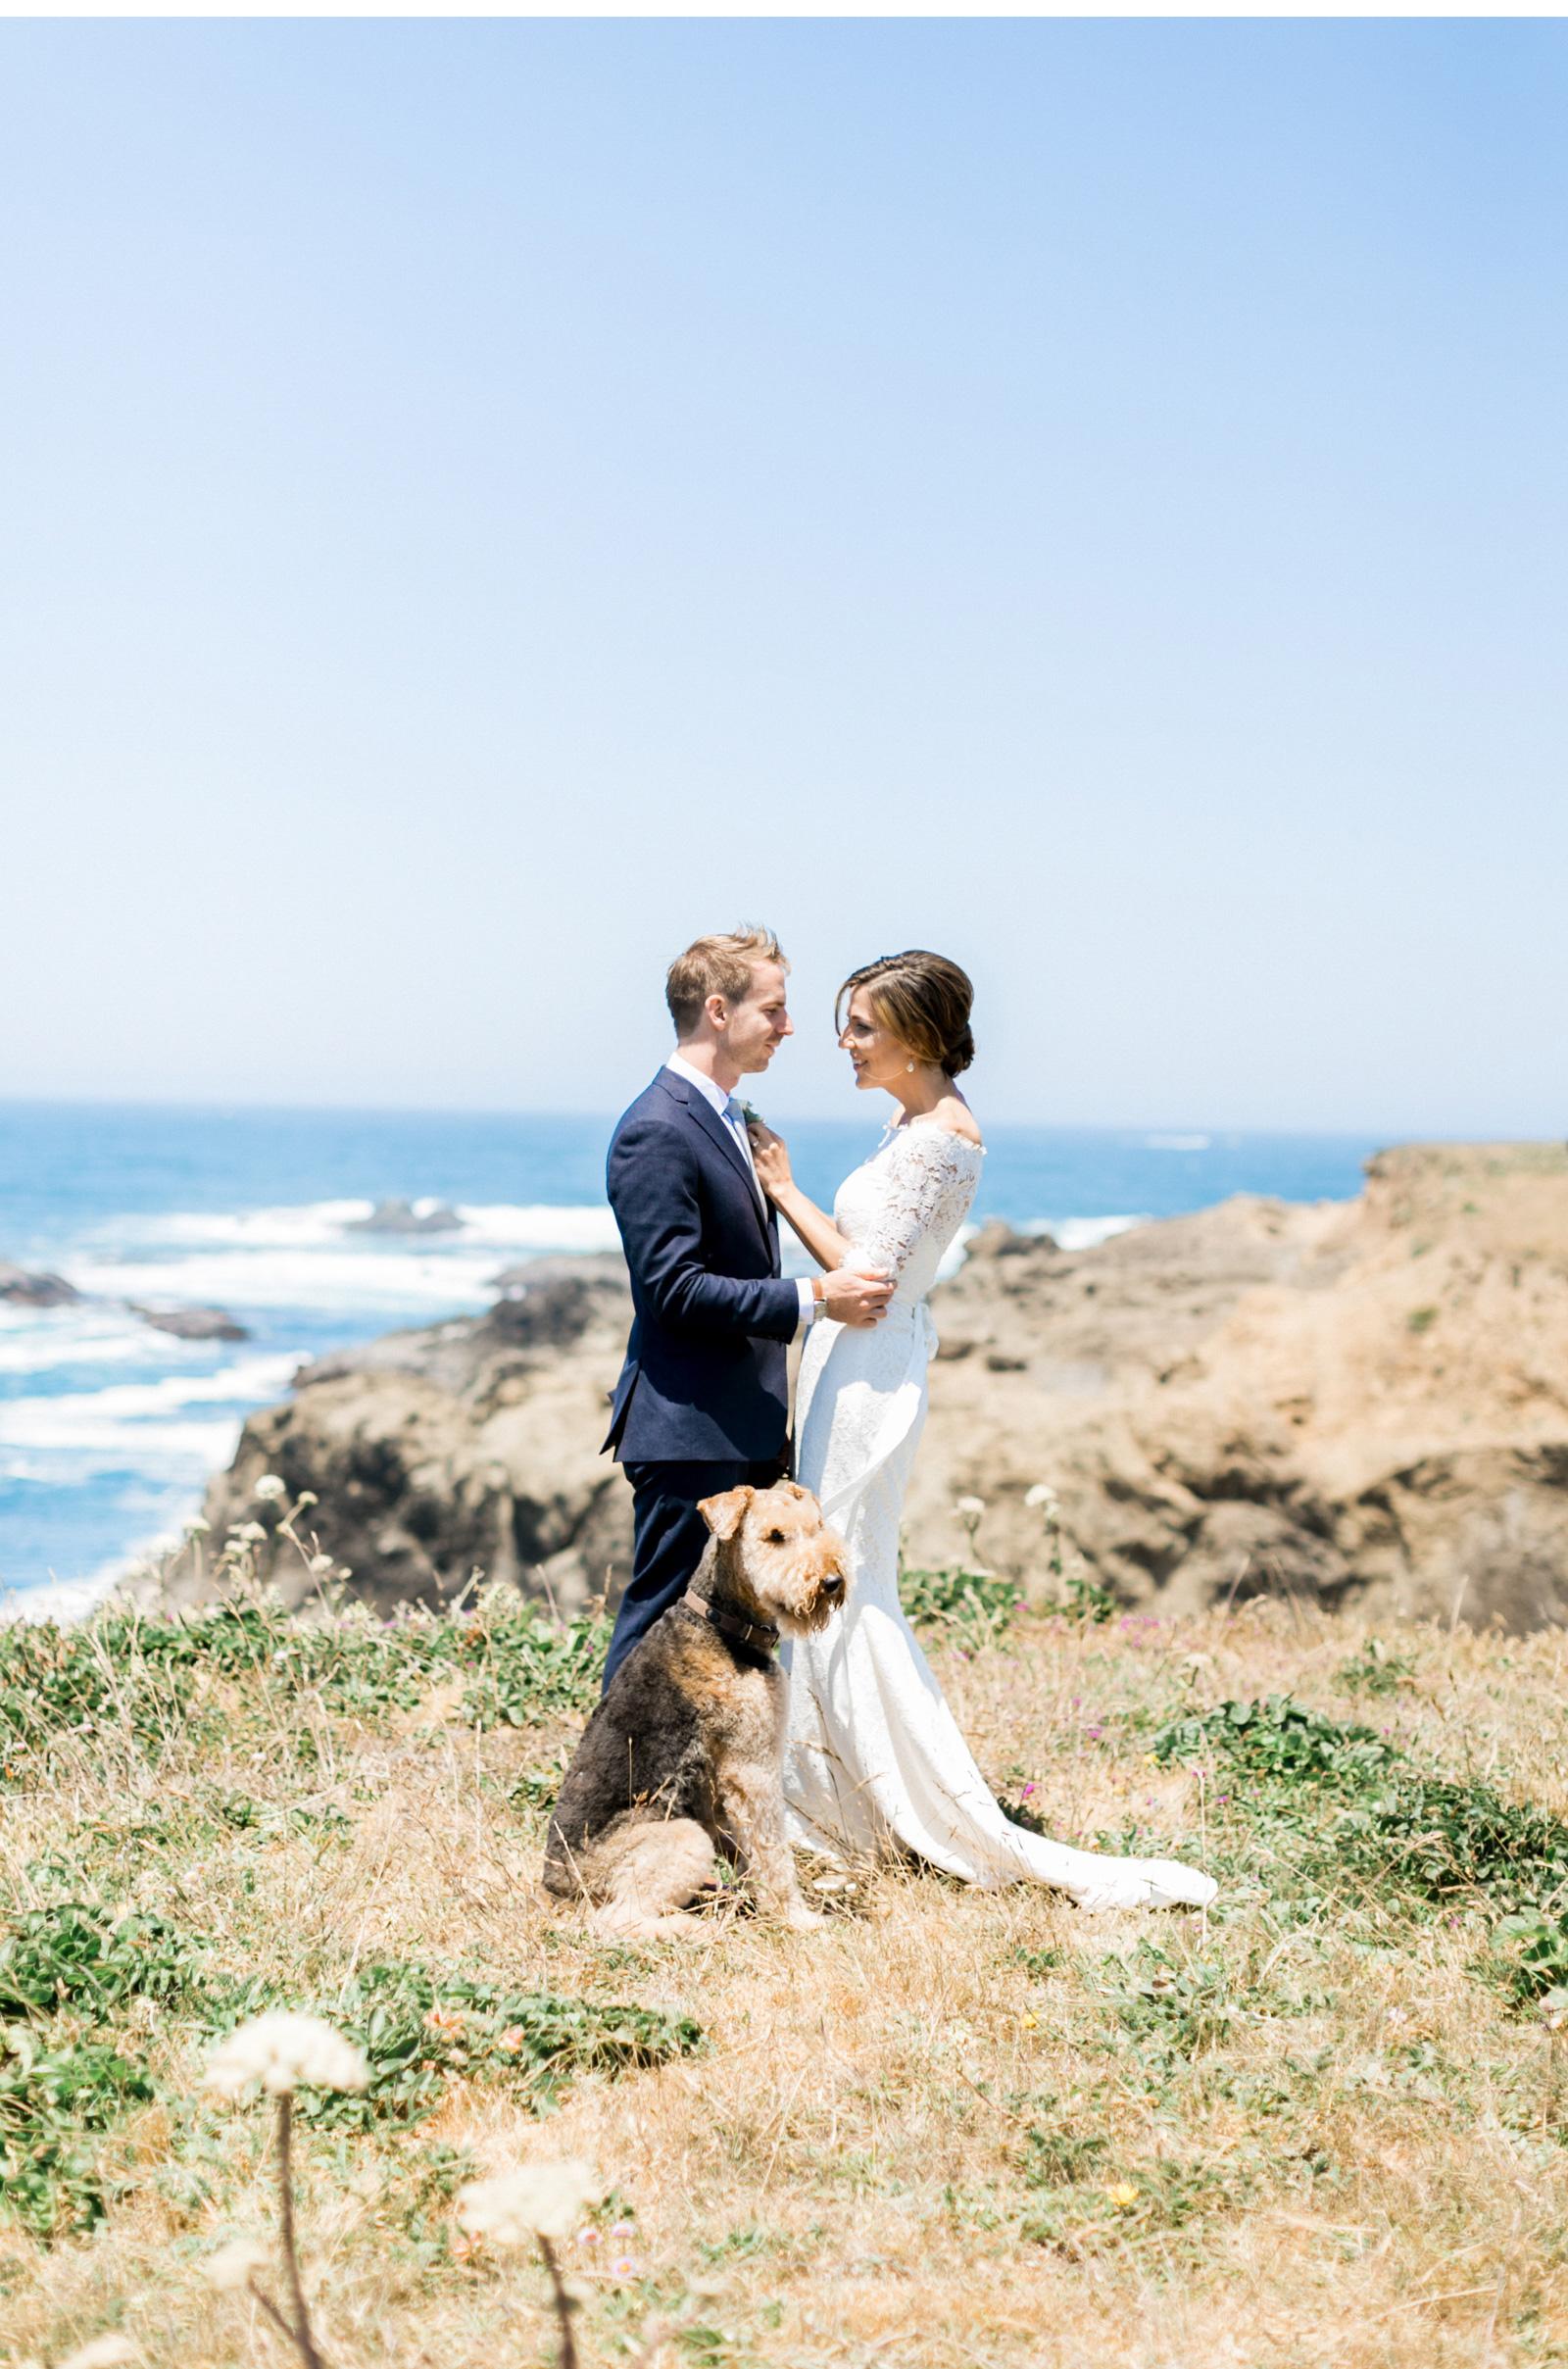 Mendocino-wedding-photographer-natalie-schutt-photography_14.jpg